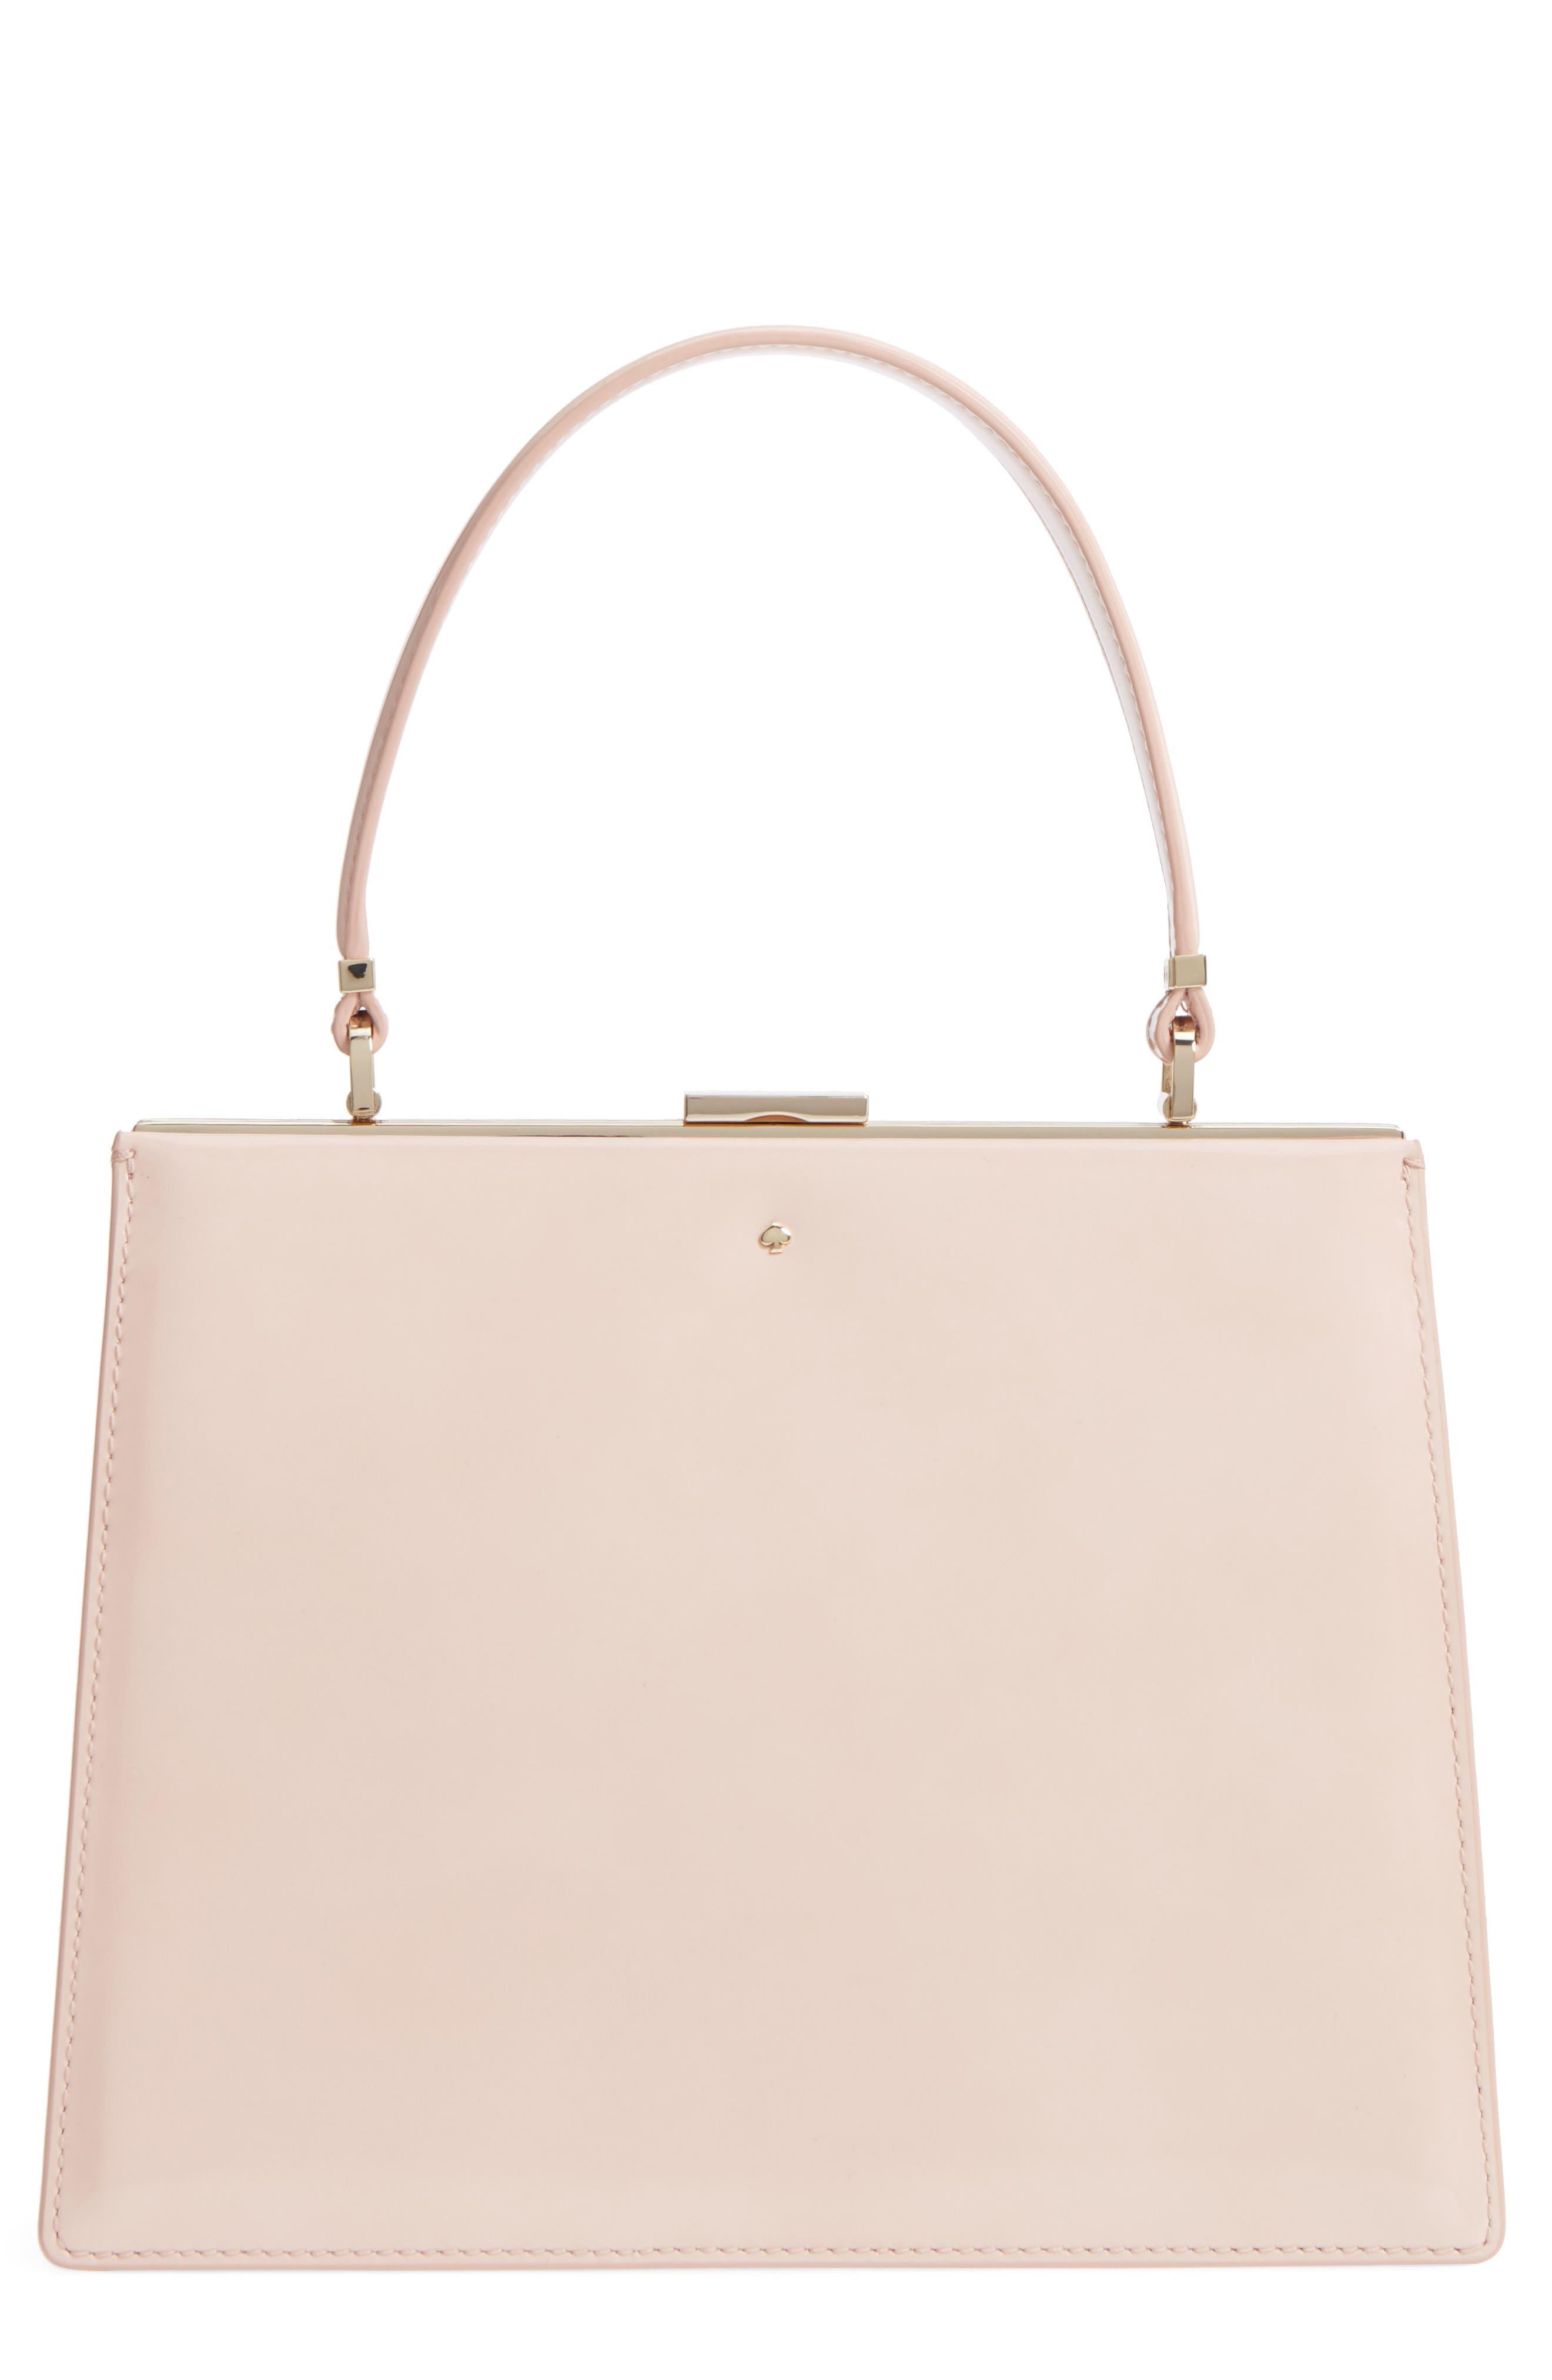 madison moore road - chari leather handbag,                         Main,                         color, Sand Flat